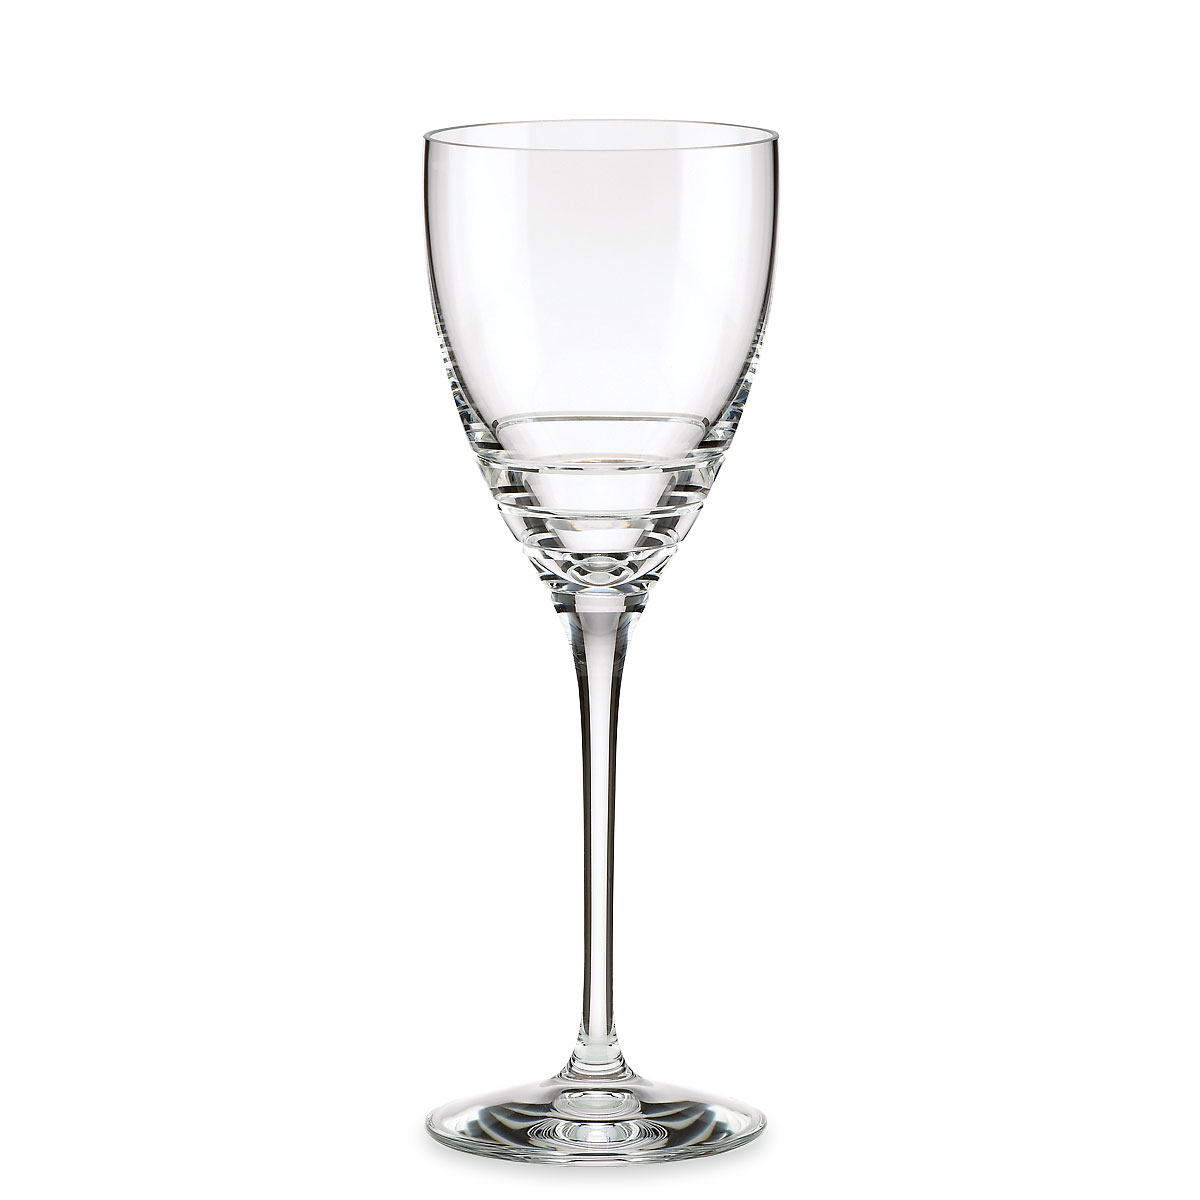 Kate Spade New York, Lenox Percival Place Crystal Wine, Single